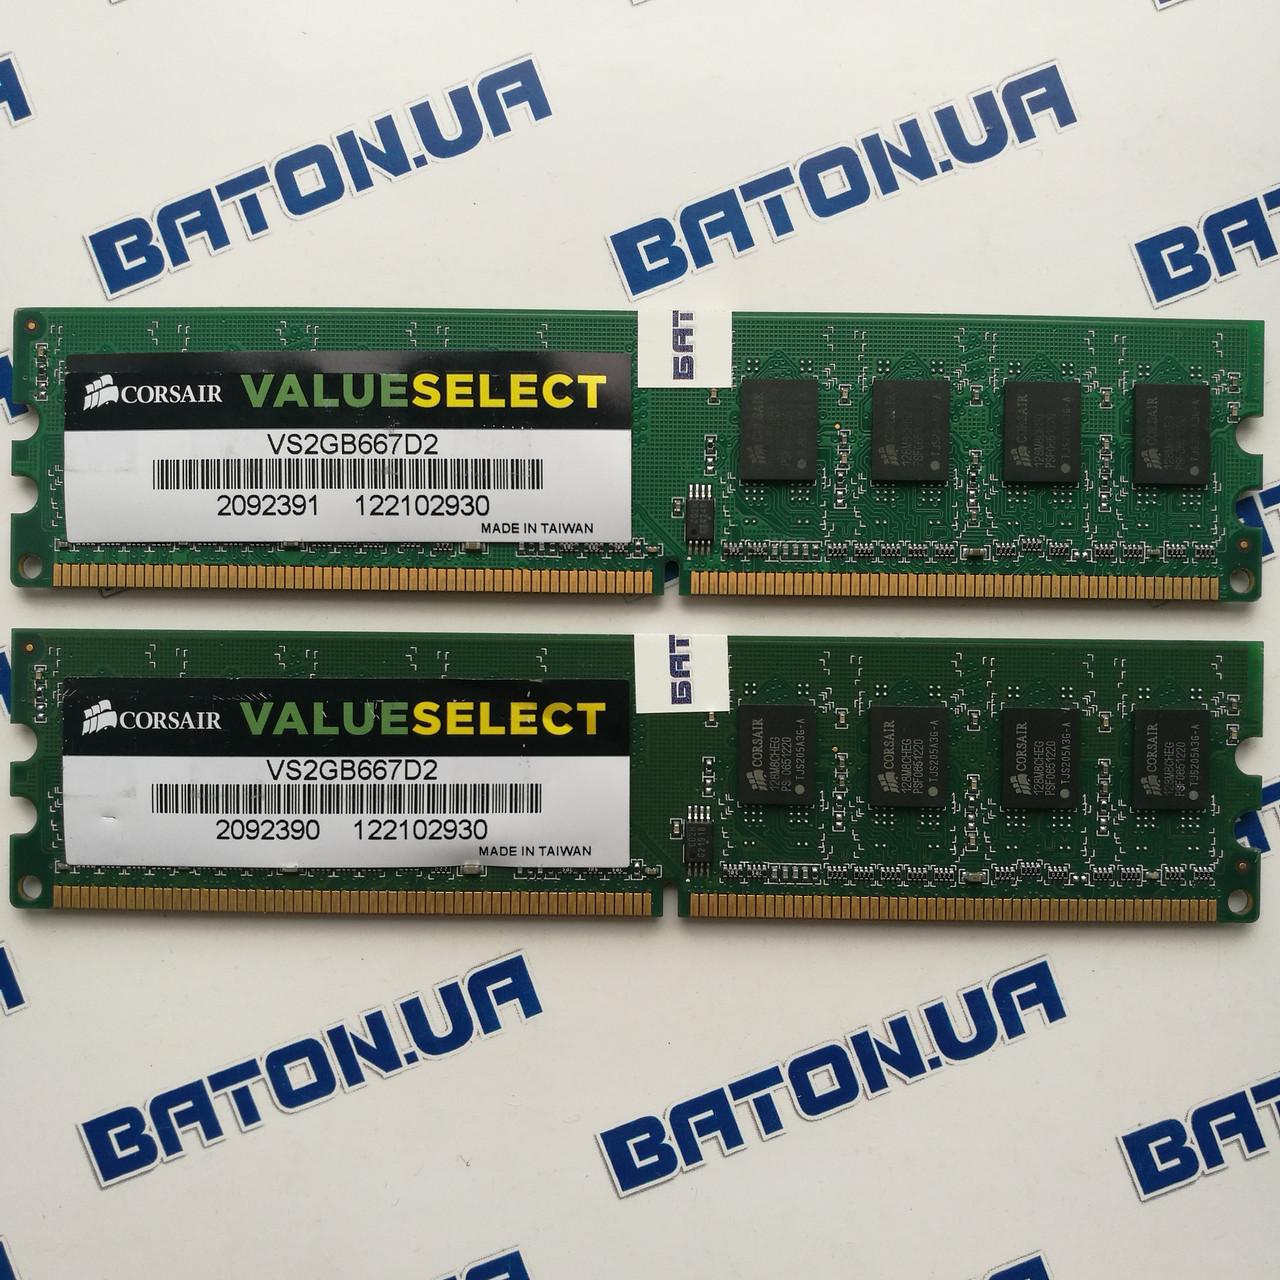 Оперативная память Corsair DDR2 4Gb 667MHz PC2 5300U CL5 (VS2GB667D2)